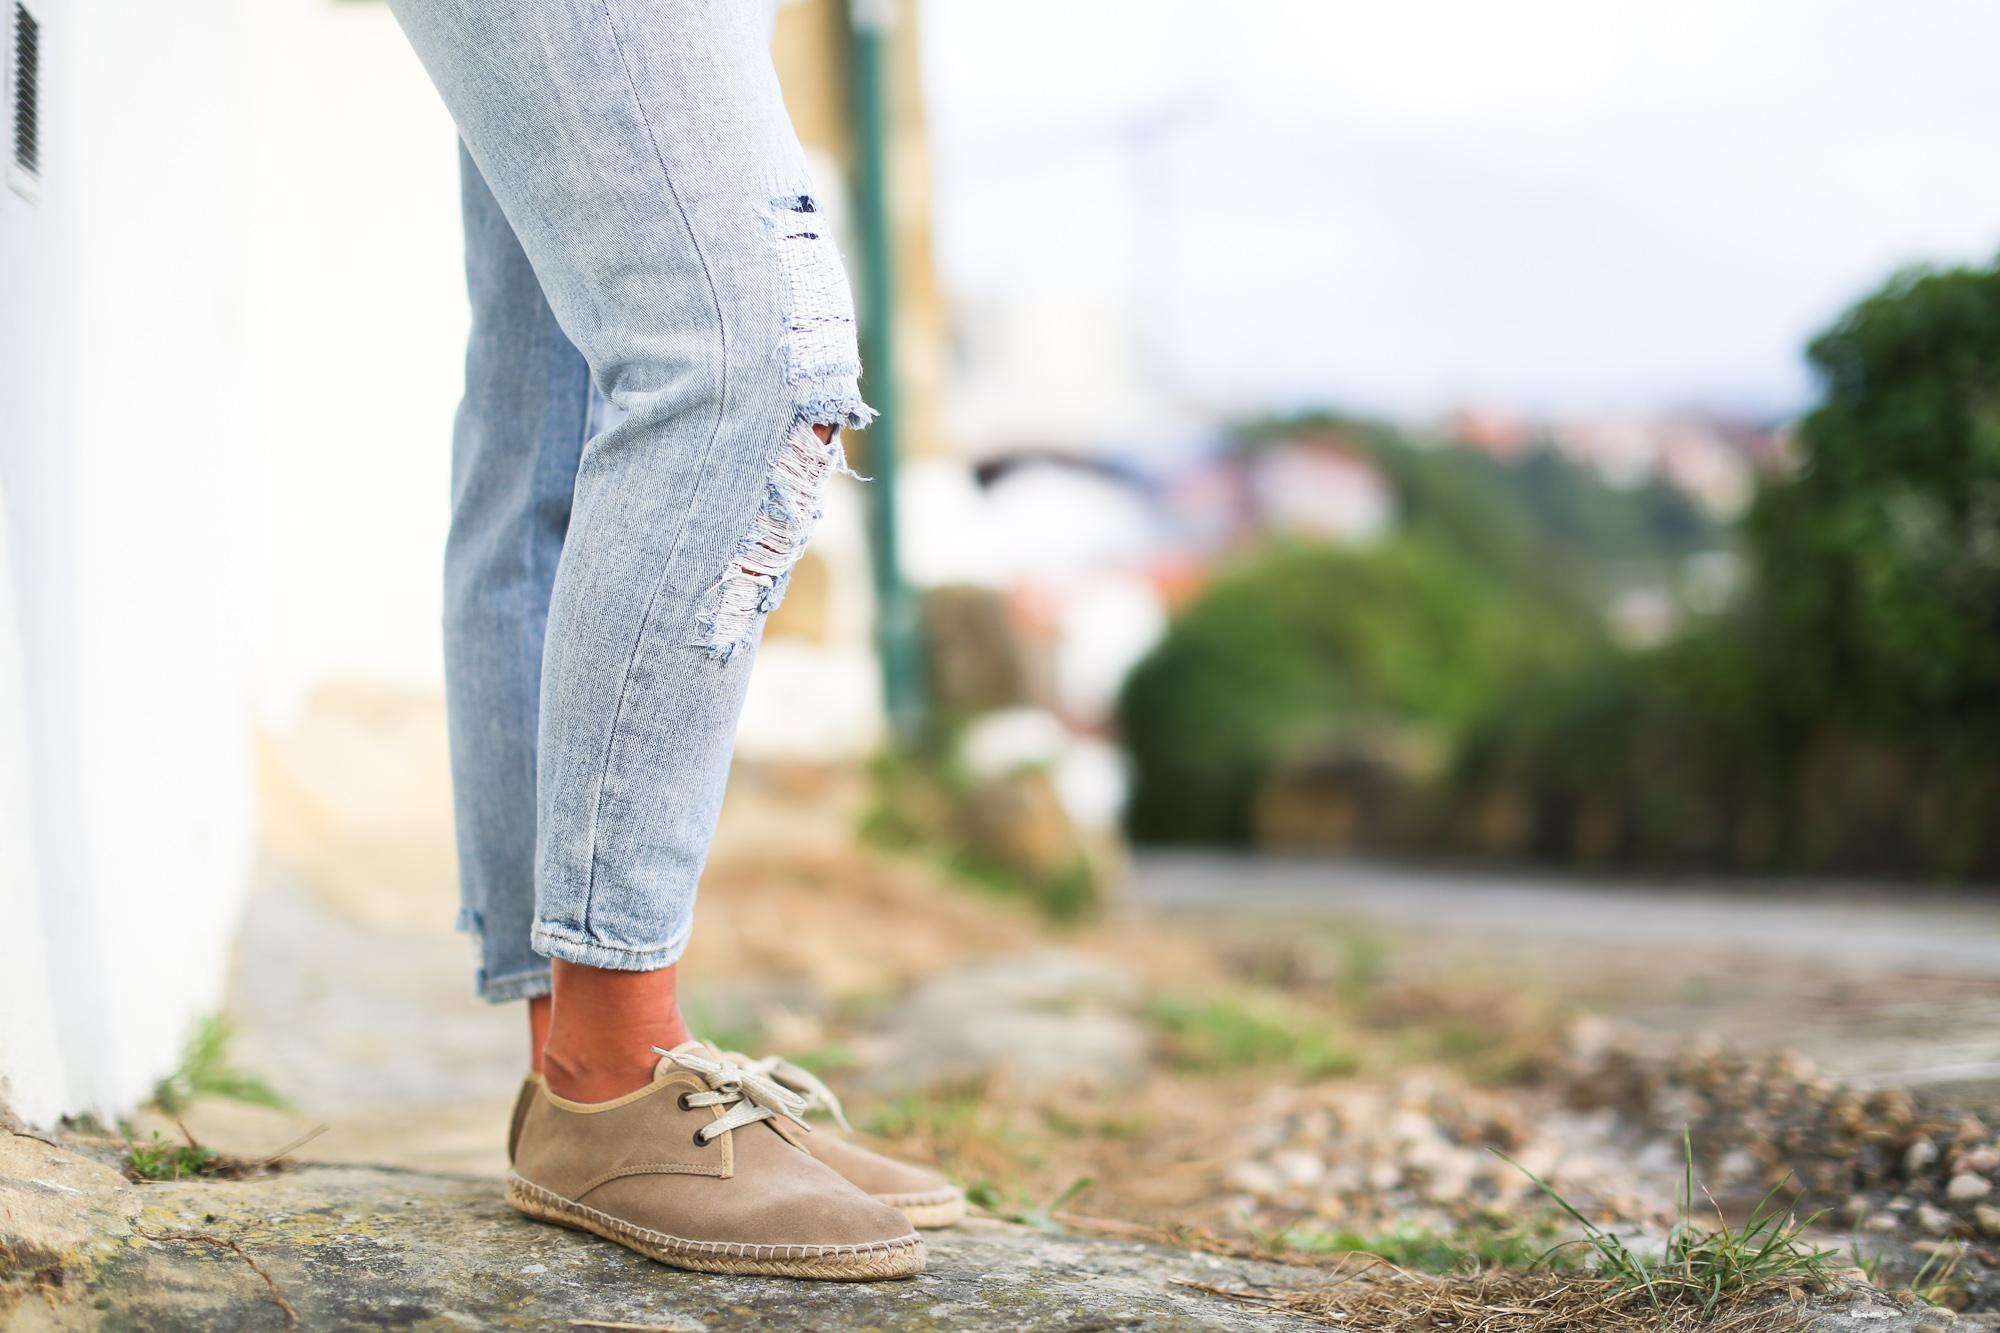 Clochet_streetstyle_suiteblanco_boyfriend_jeans_bandana_scarf_mg_linen_bag-6